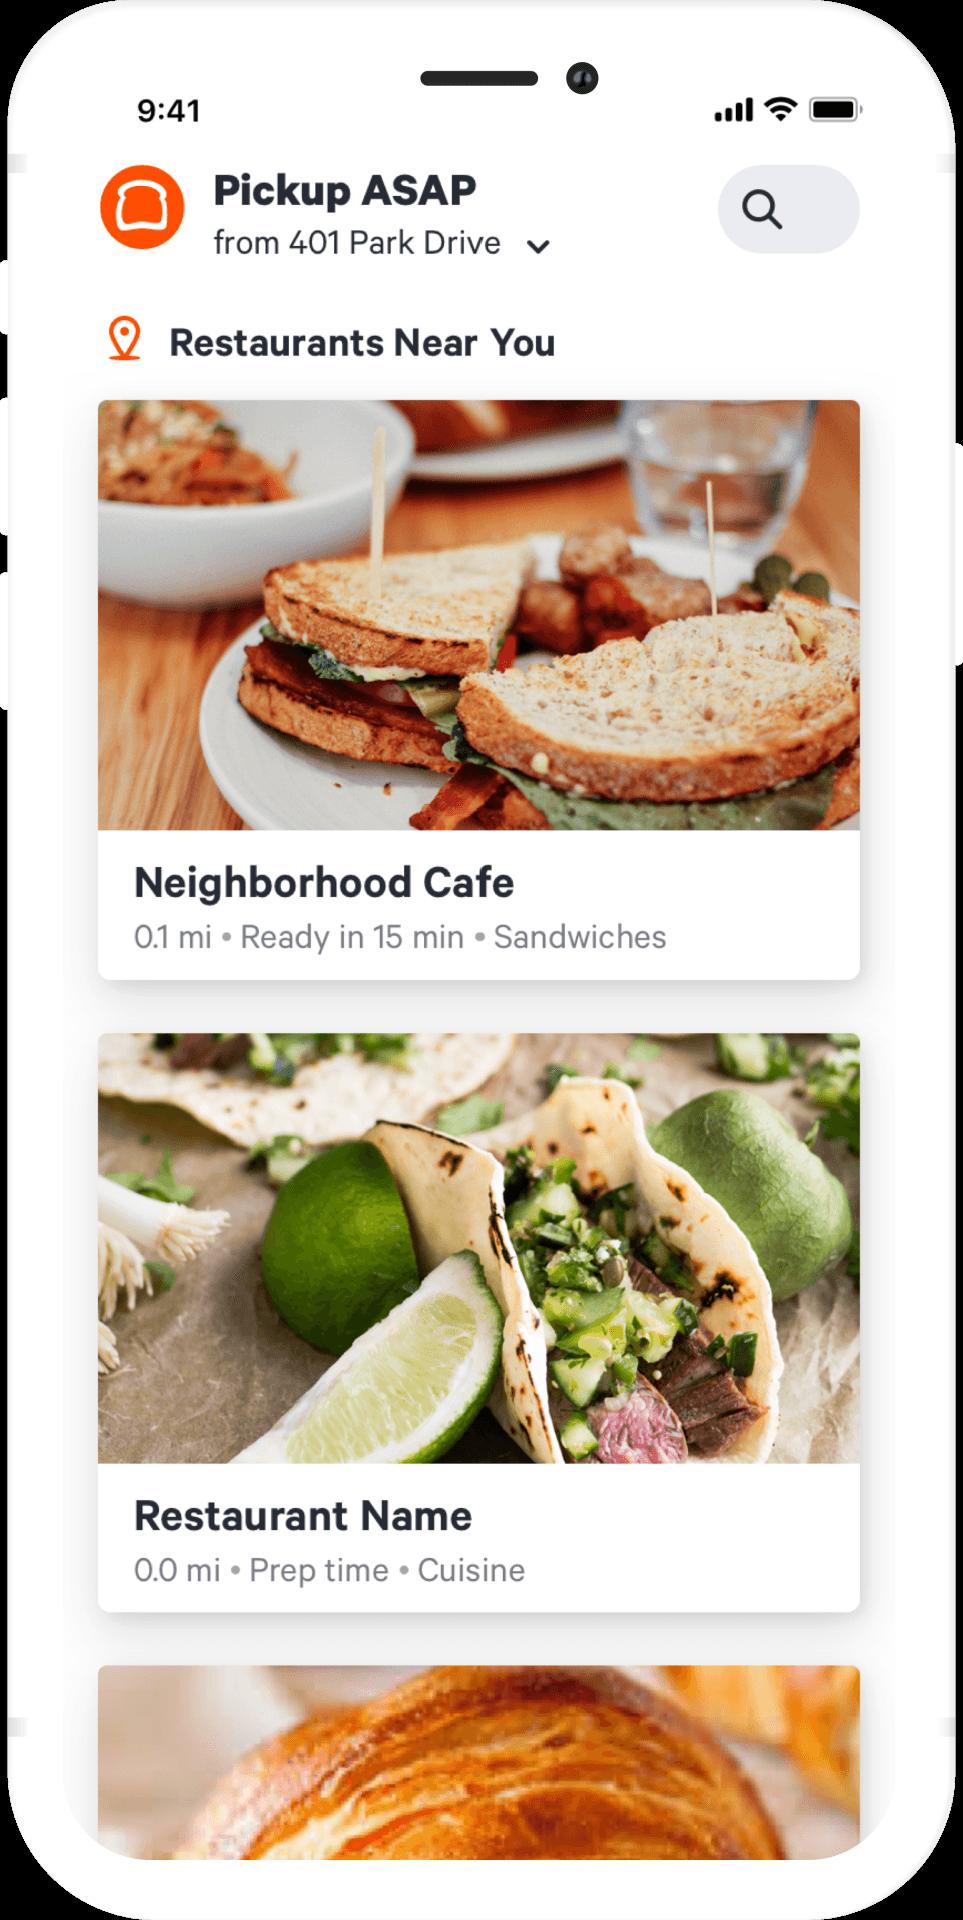 Toast Takeout Restaurant Pickup App In 2020 Vegan Restaurants Sandwich Restaurant Food